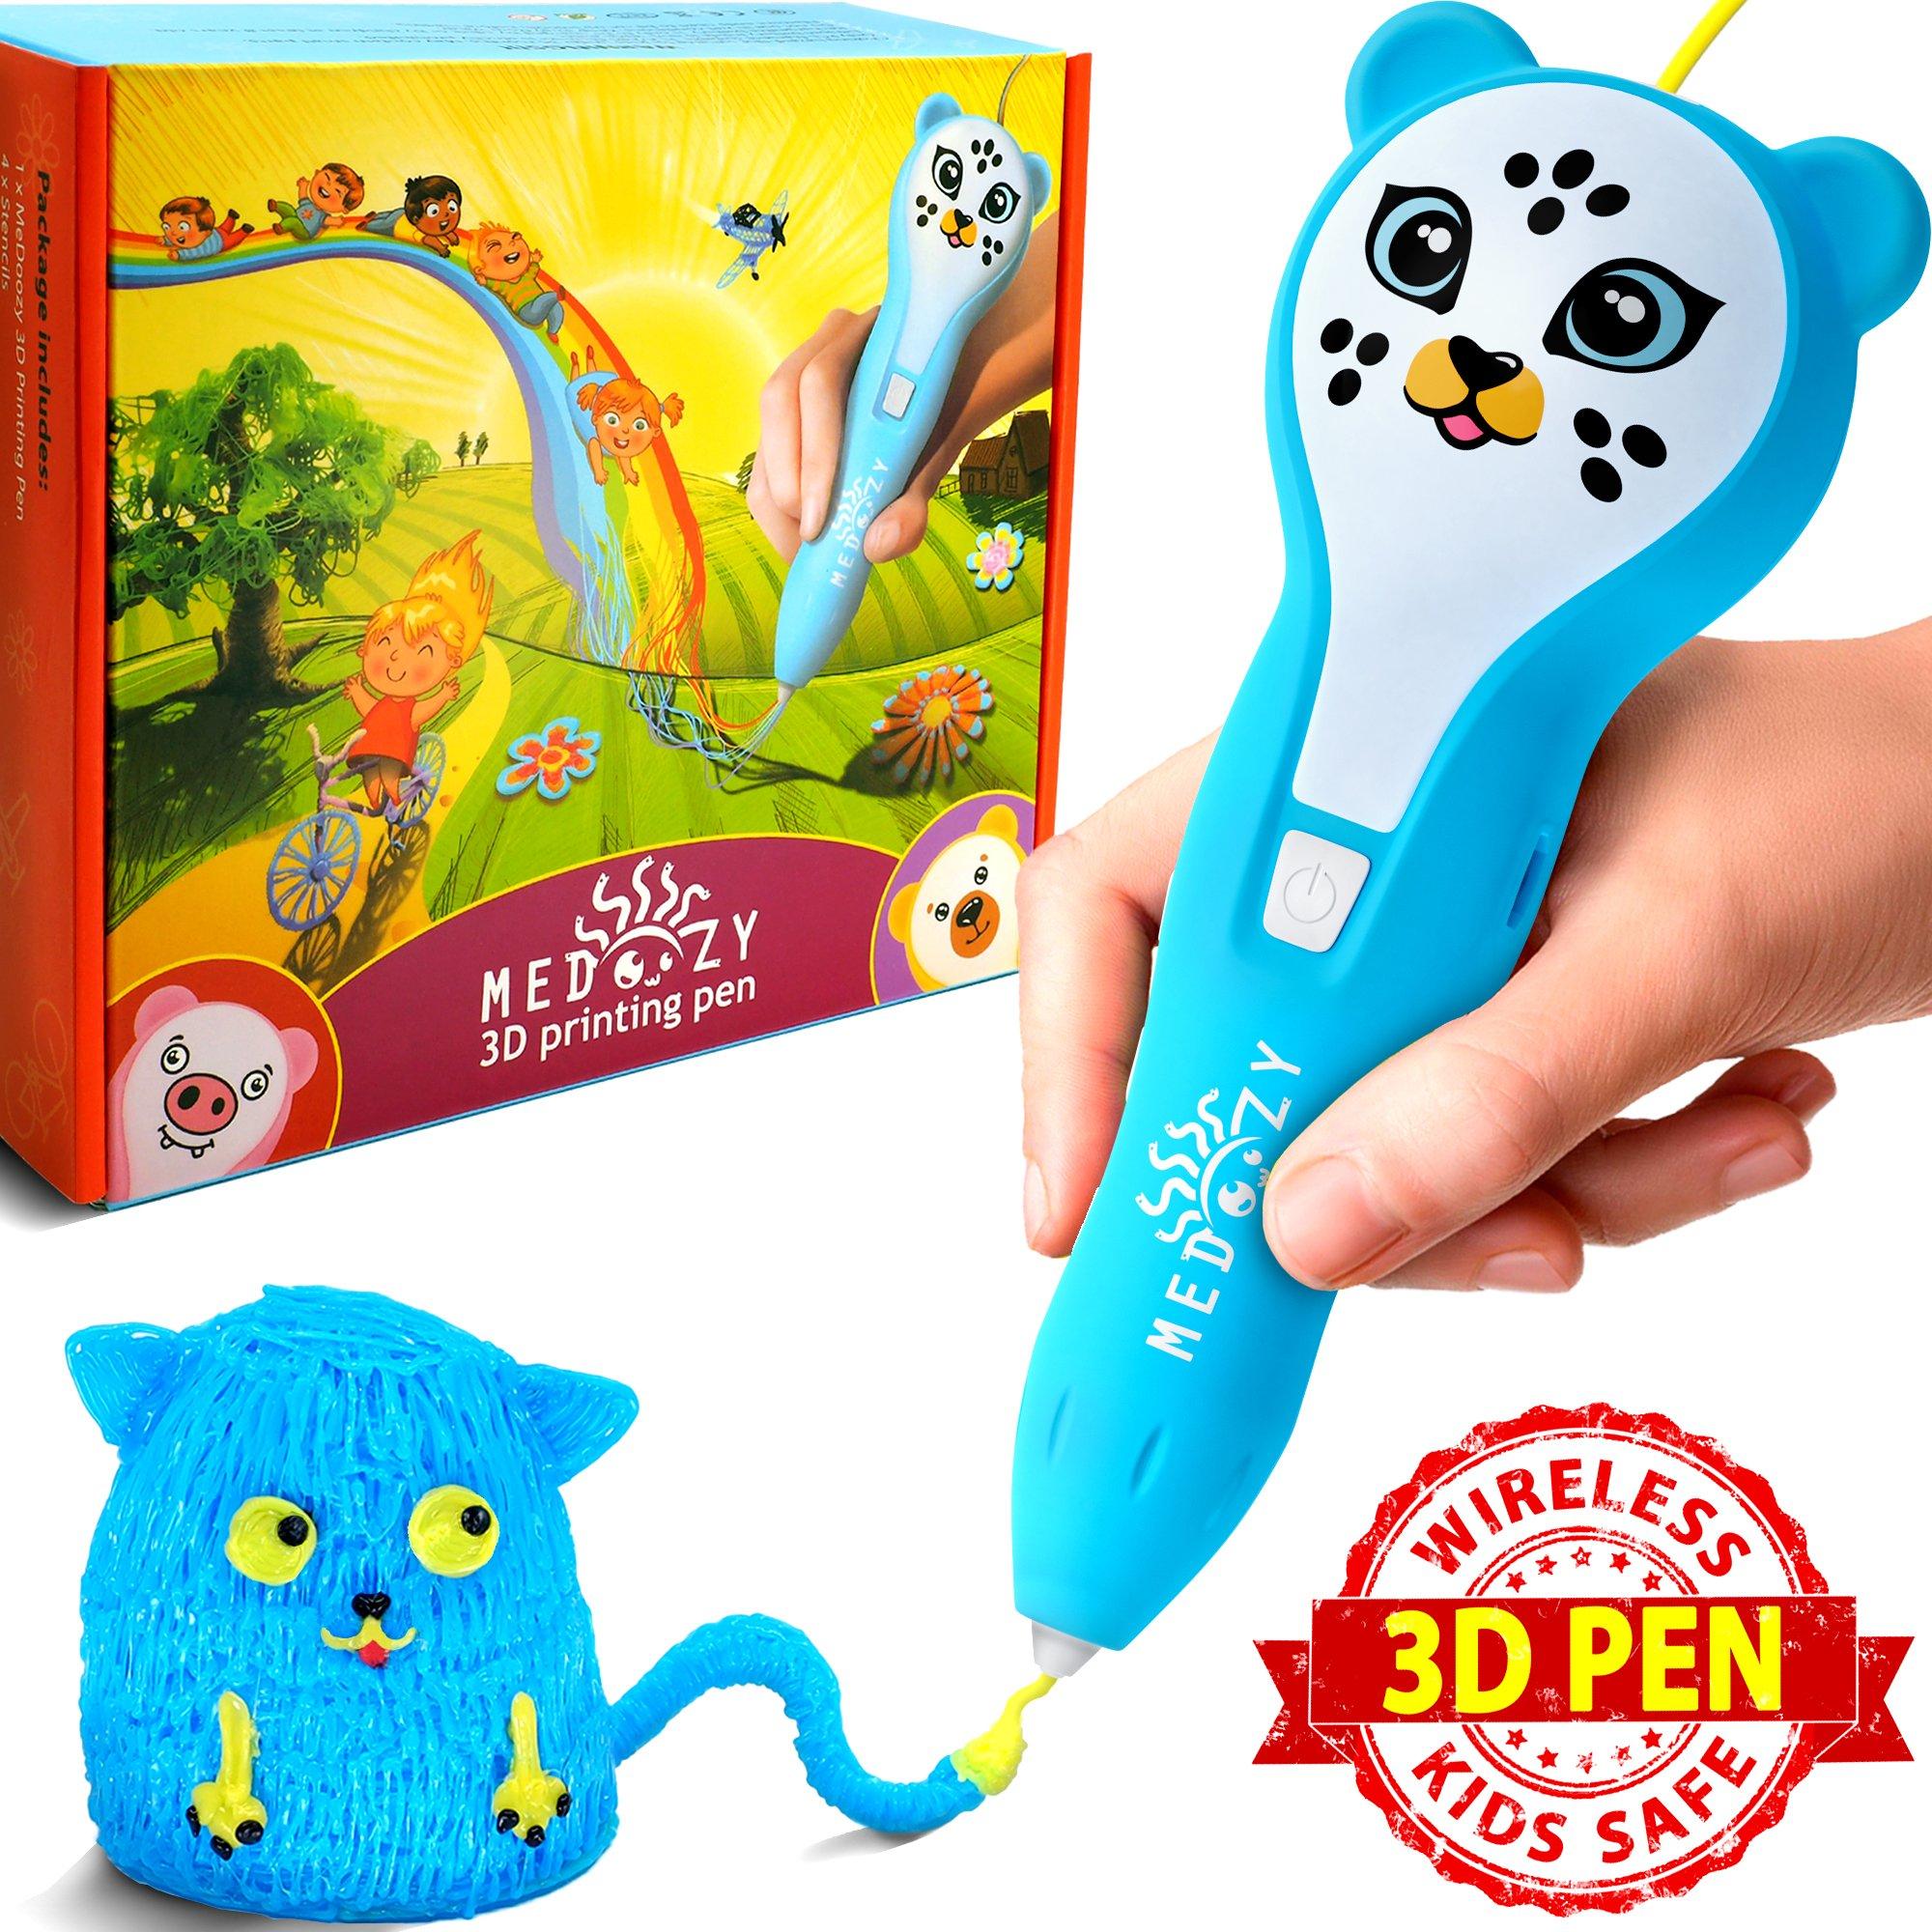 3D Pen for Kids – 3D Printing Doodler Pen Set – Preschool Learning Toys for Girls Boys and Teens – 3D Drawing Doodle Starter Kit – Cute Gifts 3D Printer for Kids – Best Selling Craft Tool Kits (Blue)